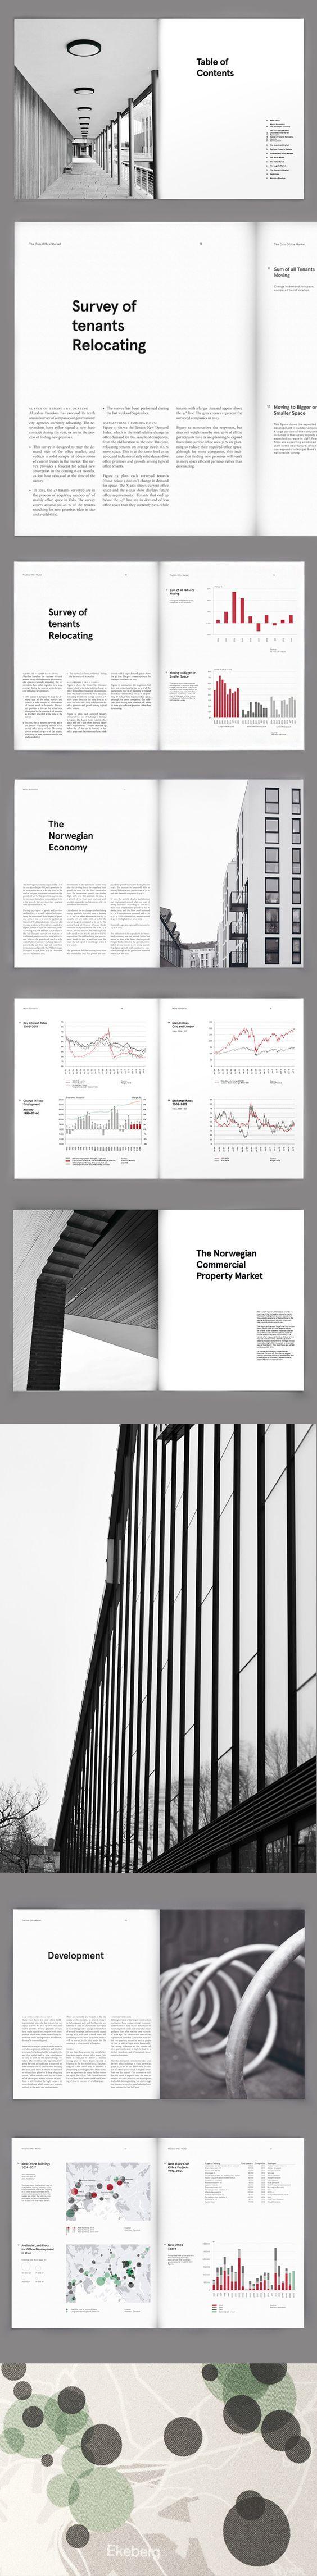 Akershus Eiendom Annual Report Layout Design   Publication and Print Design: